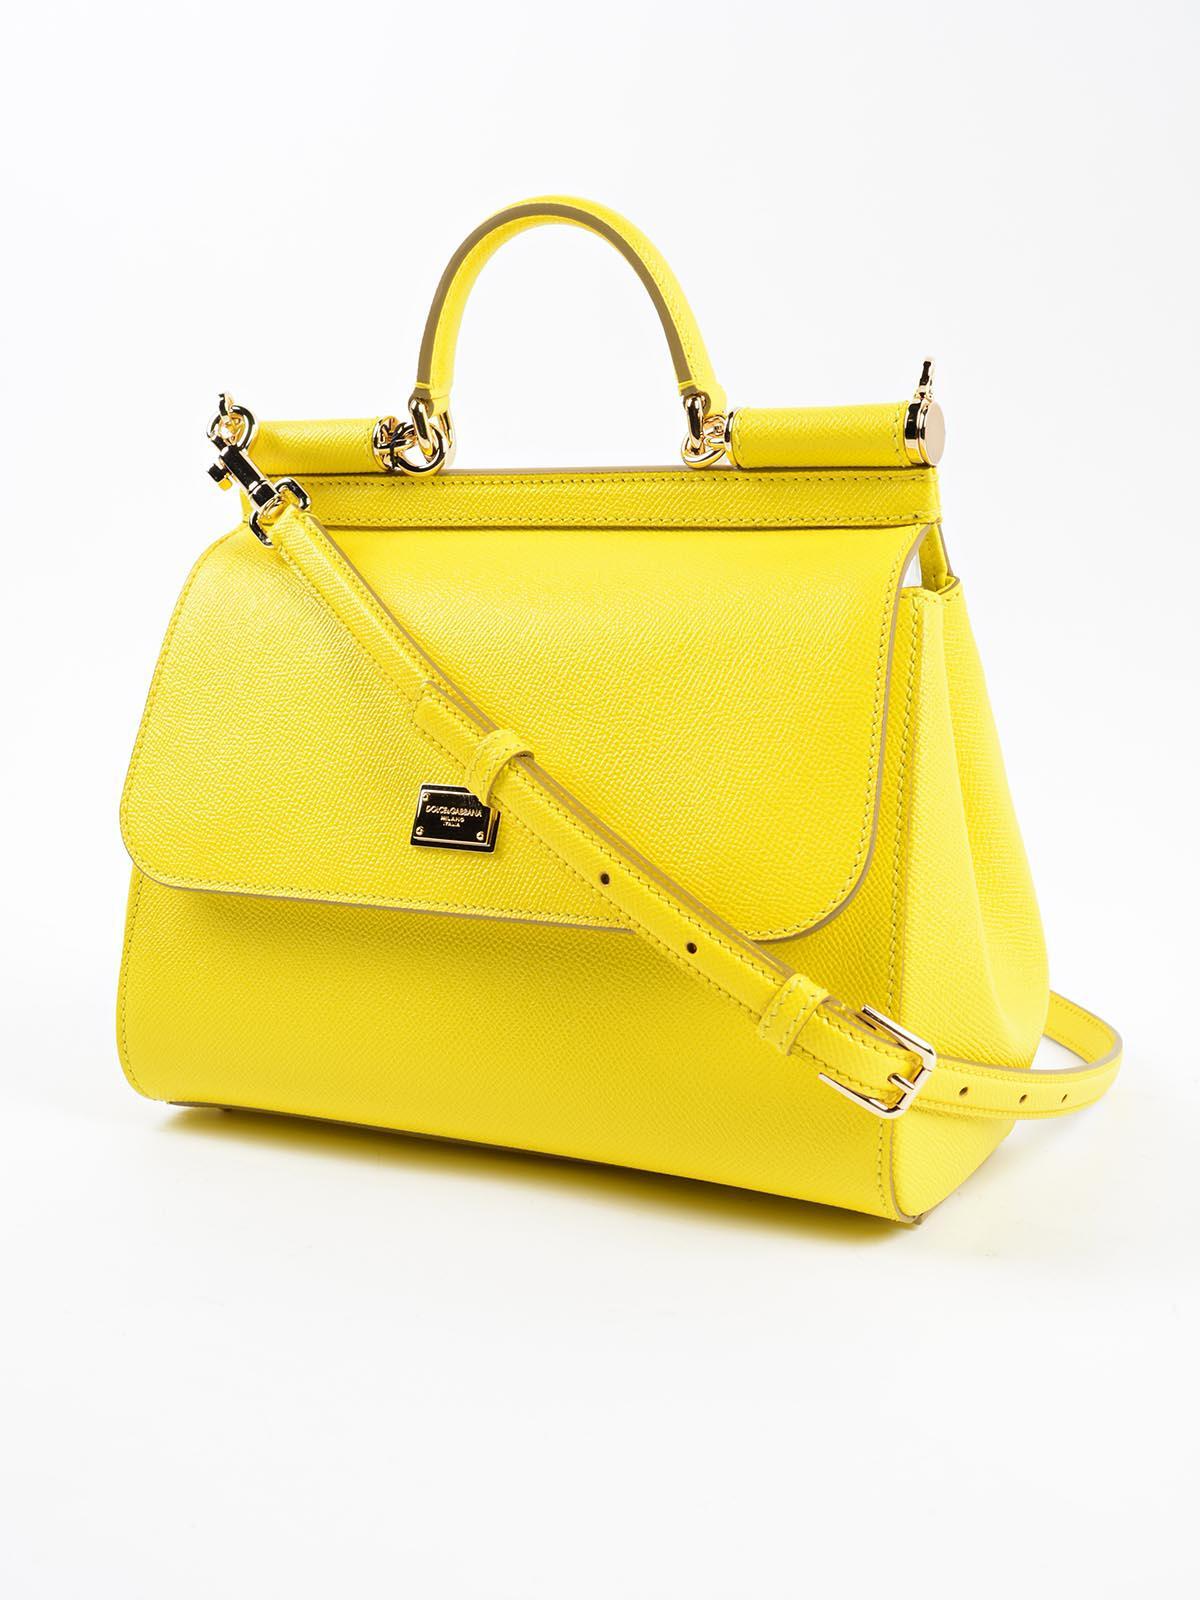 Dolce   Gabbana St.dauphine Handbag in Yellow - Lyst cf3b4f530310b